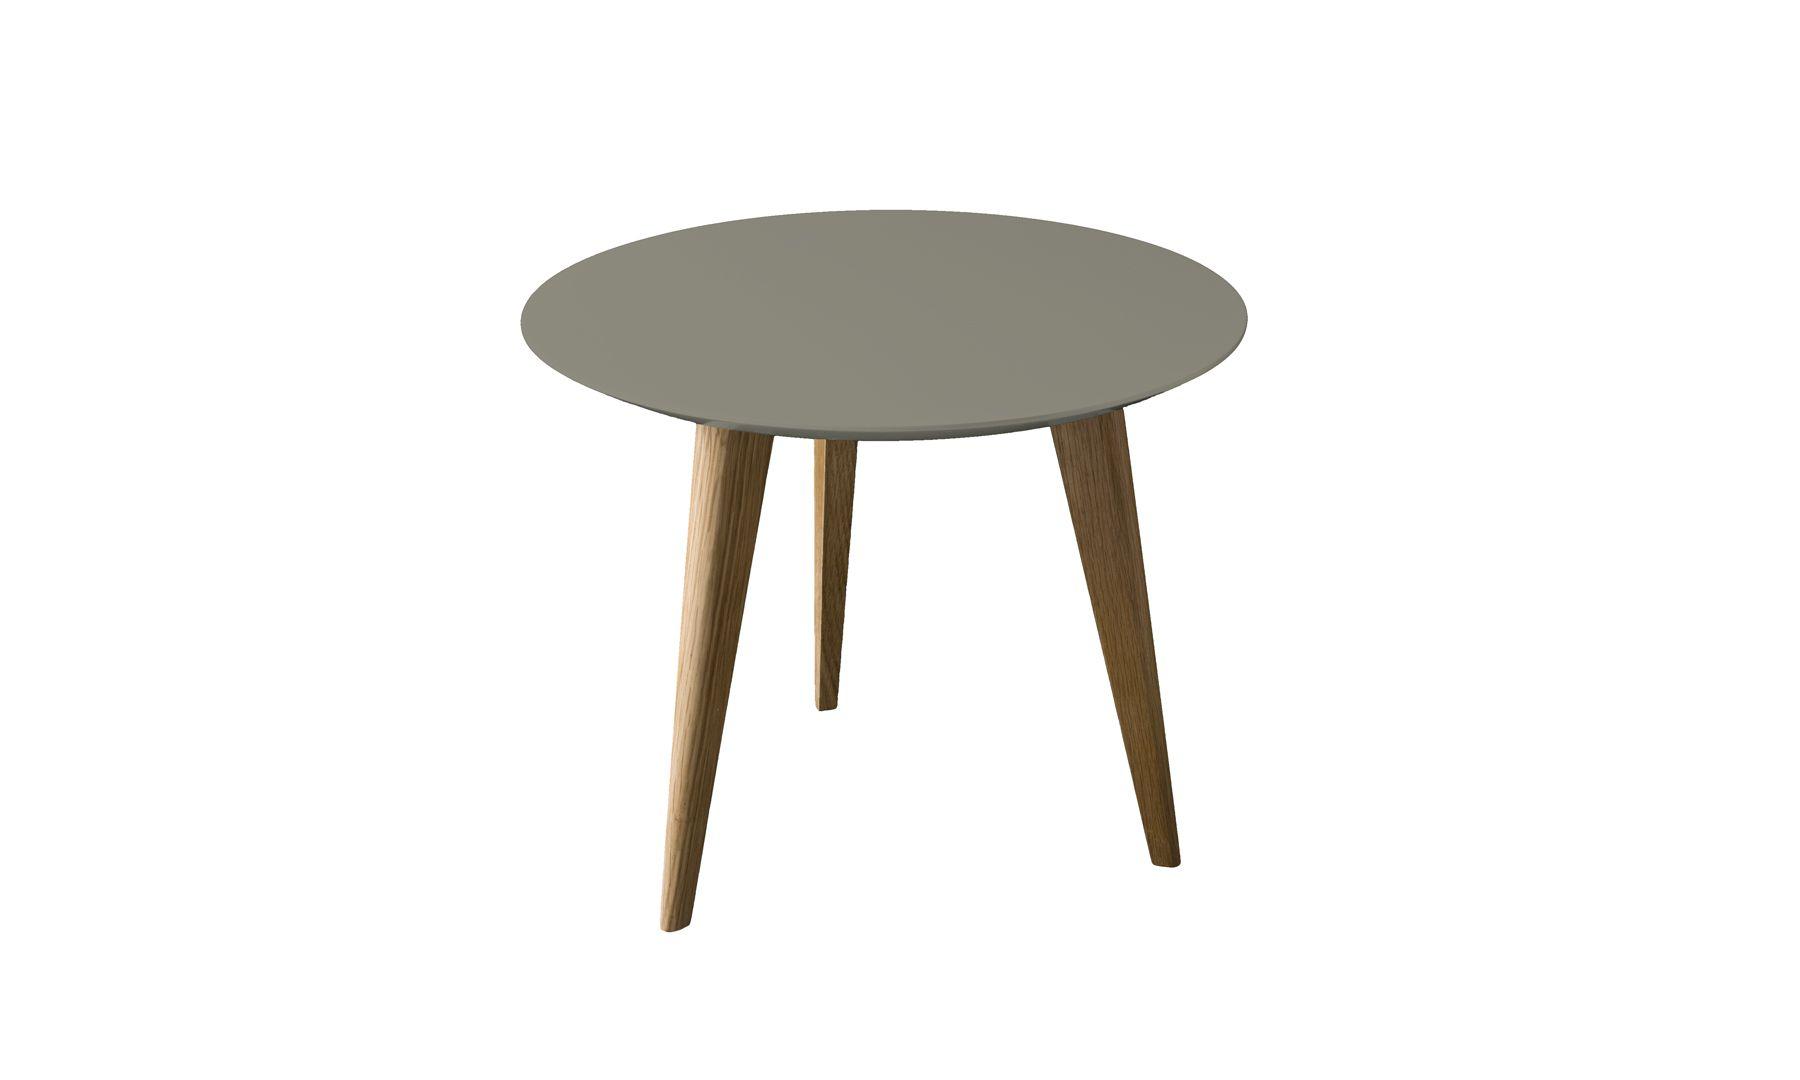 MOBILIER : TABLE LALINDE RONDE, SENTOU